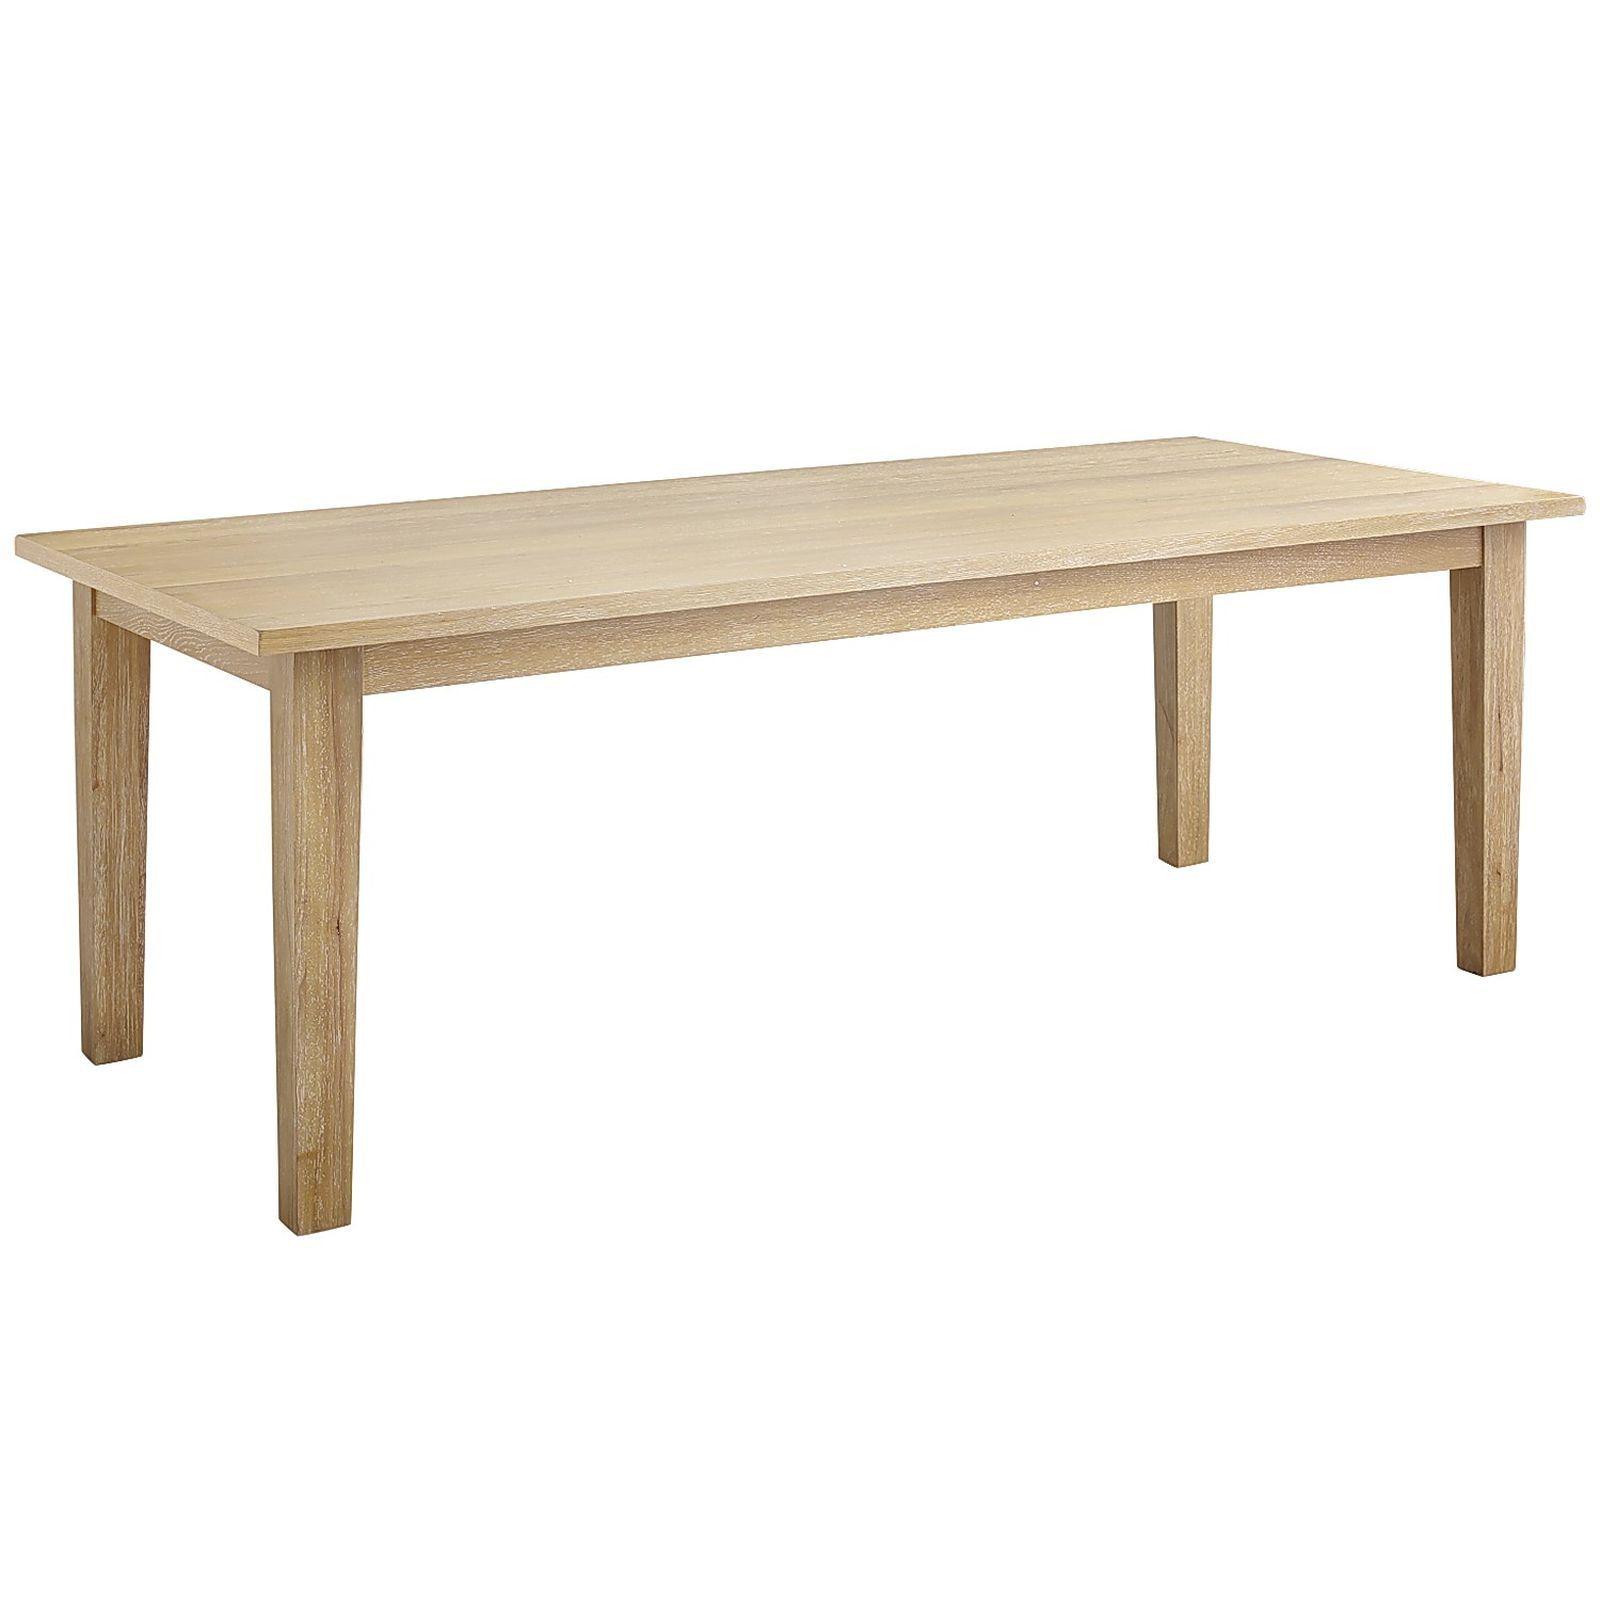 • 84w x 42d x 30h • engineered wood rubberwood wood veneer • seats 8 comfortably